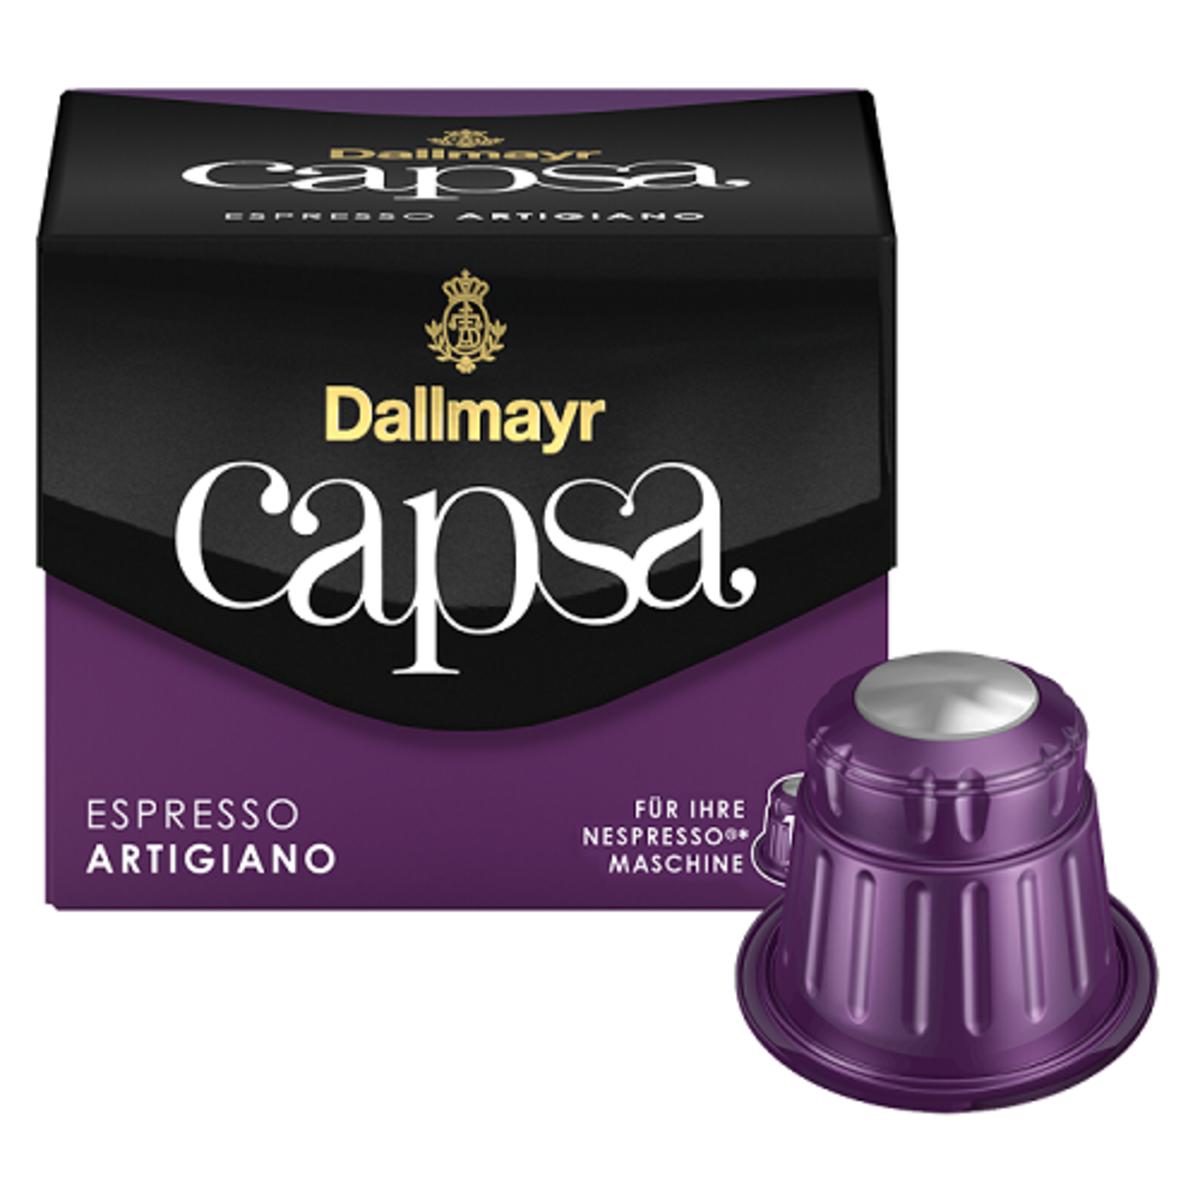 Dallmayr Espresso Artigiano - Nespresso съвместими капсули